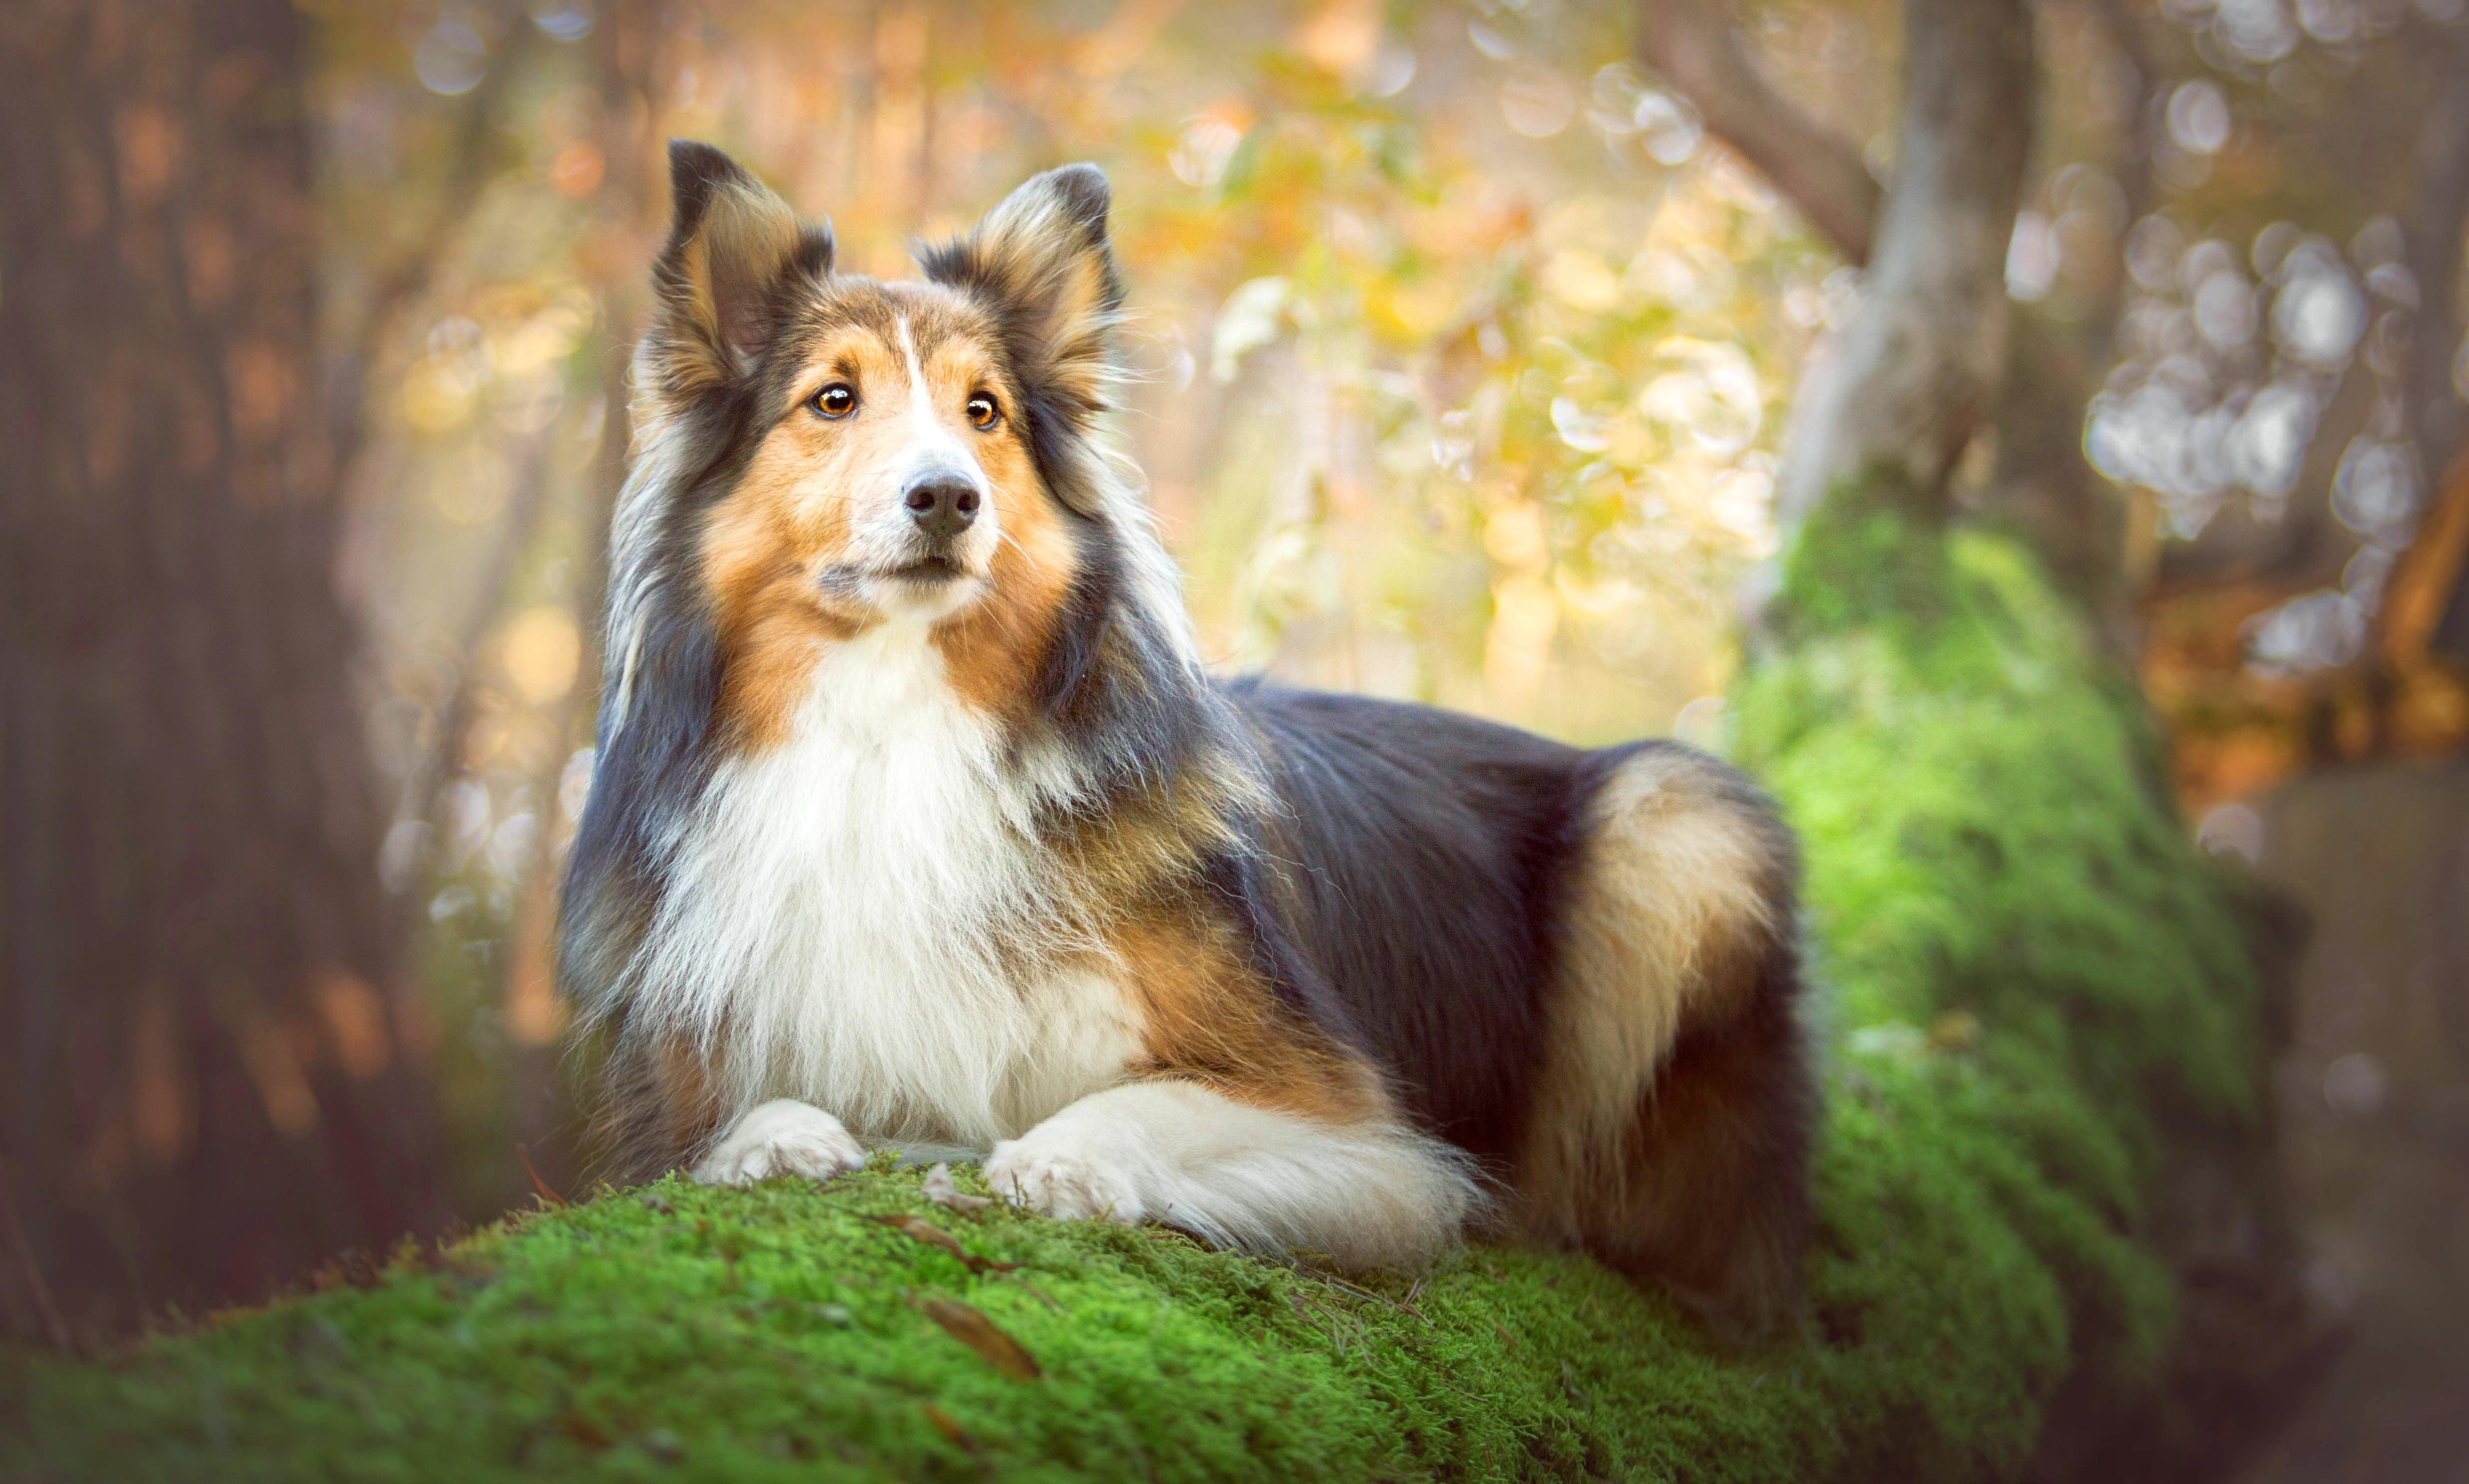 пёс язык собака на бревне  № 2524098 бесплатно